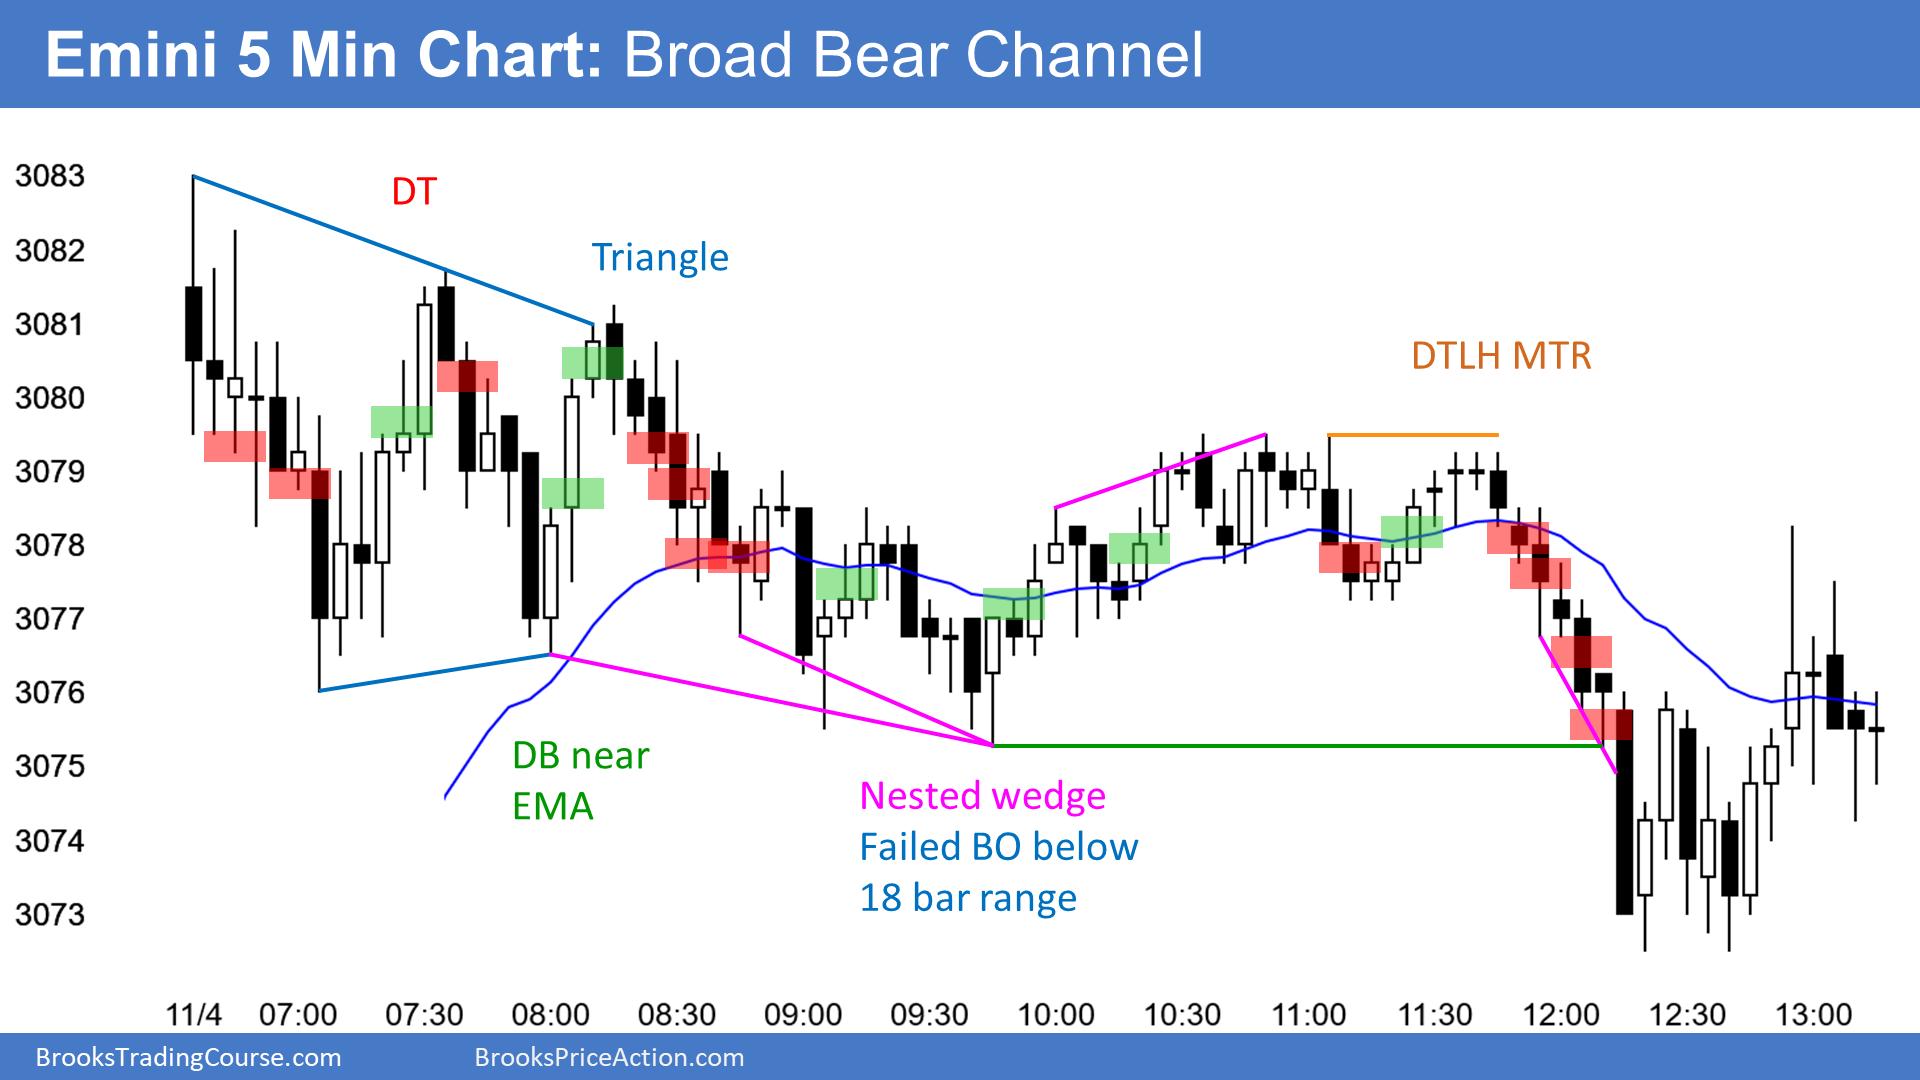 Emini broad bear channel